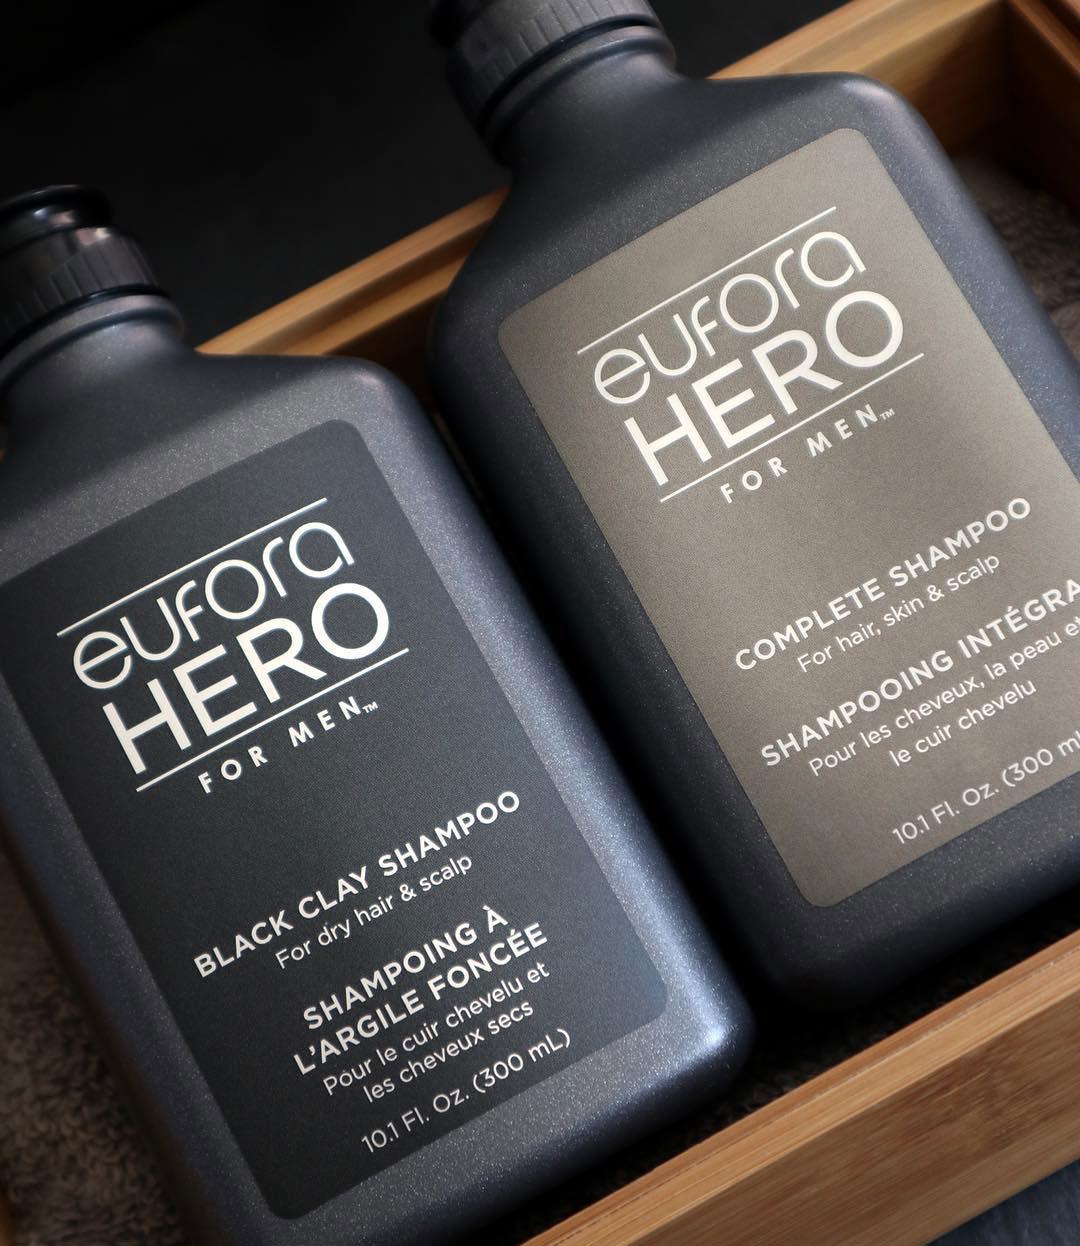 eufora-hero-black-clay-duo